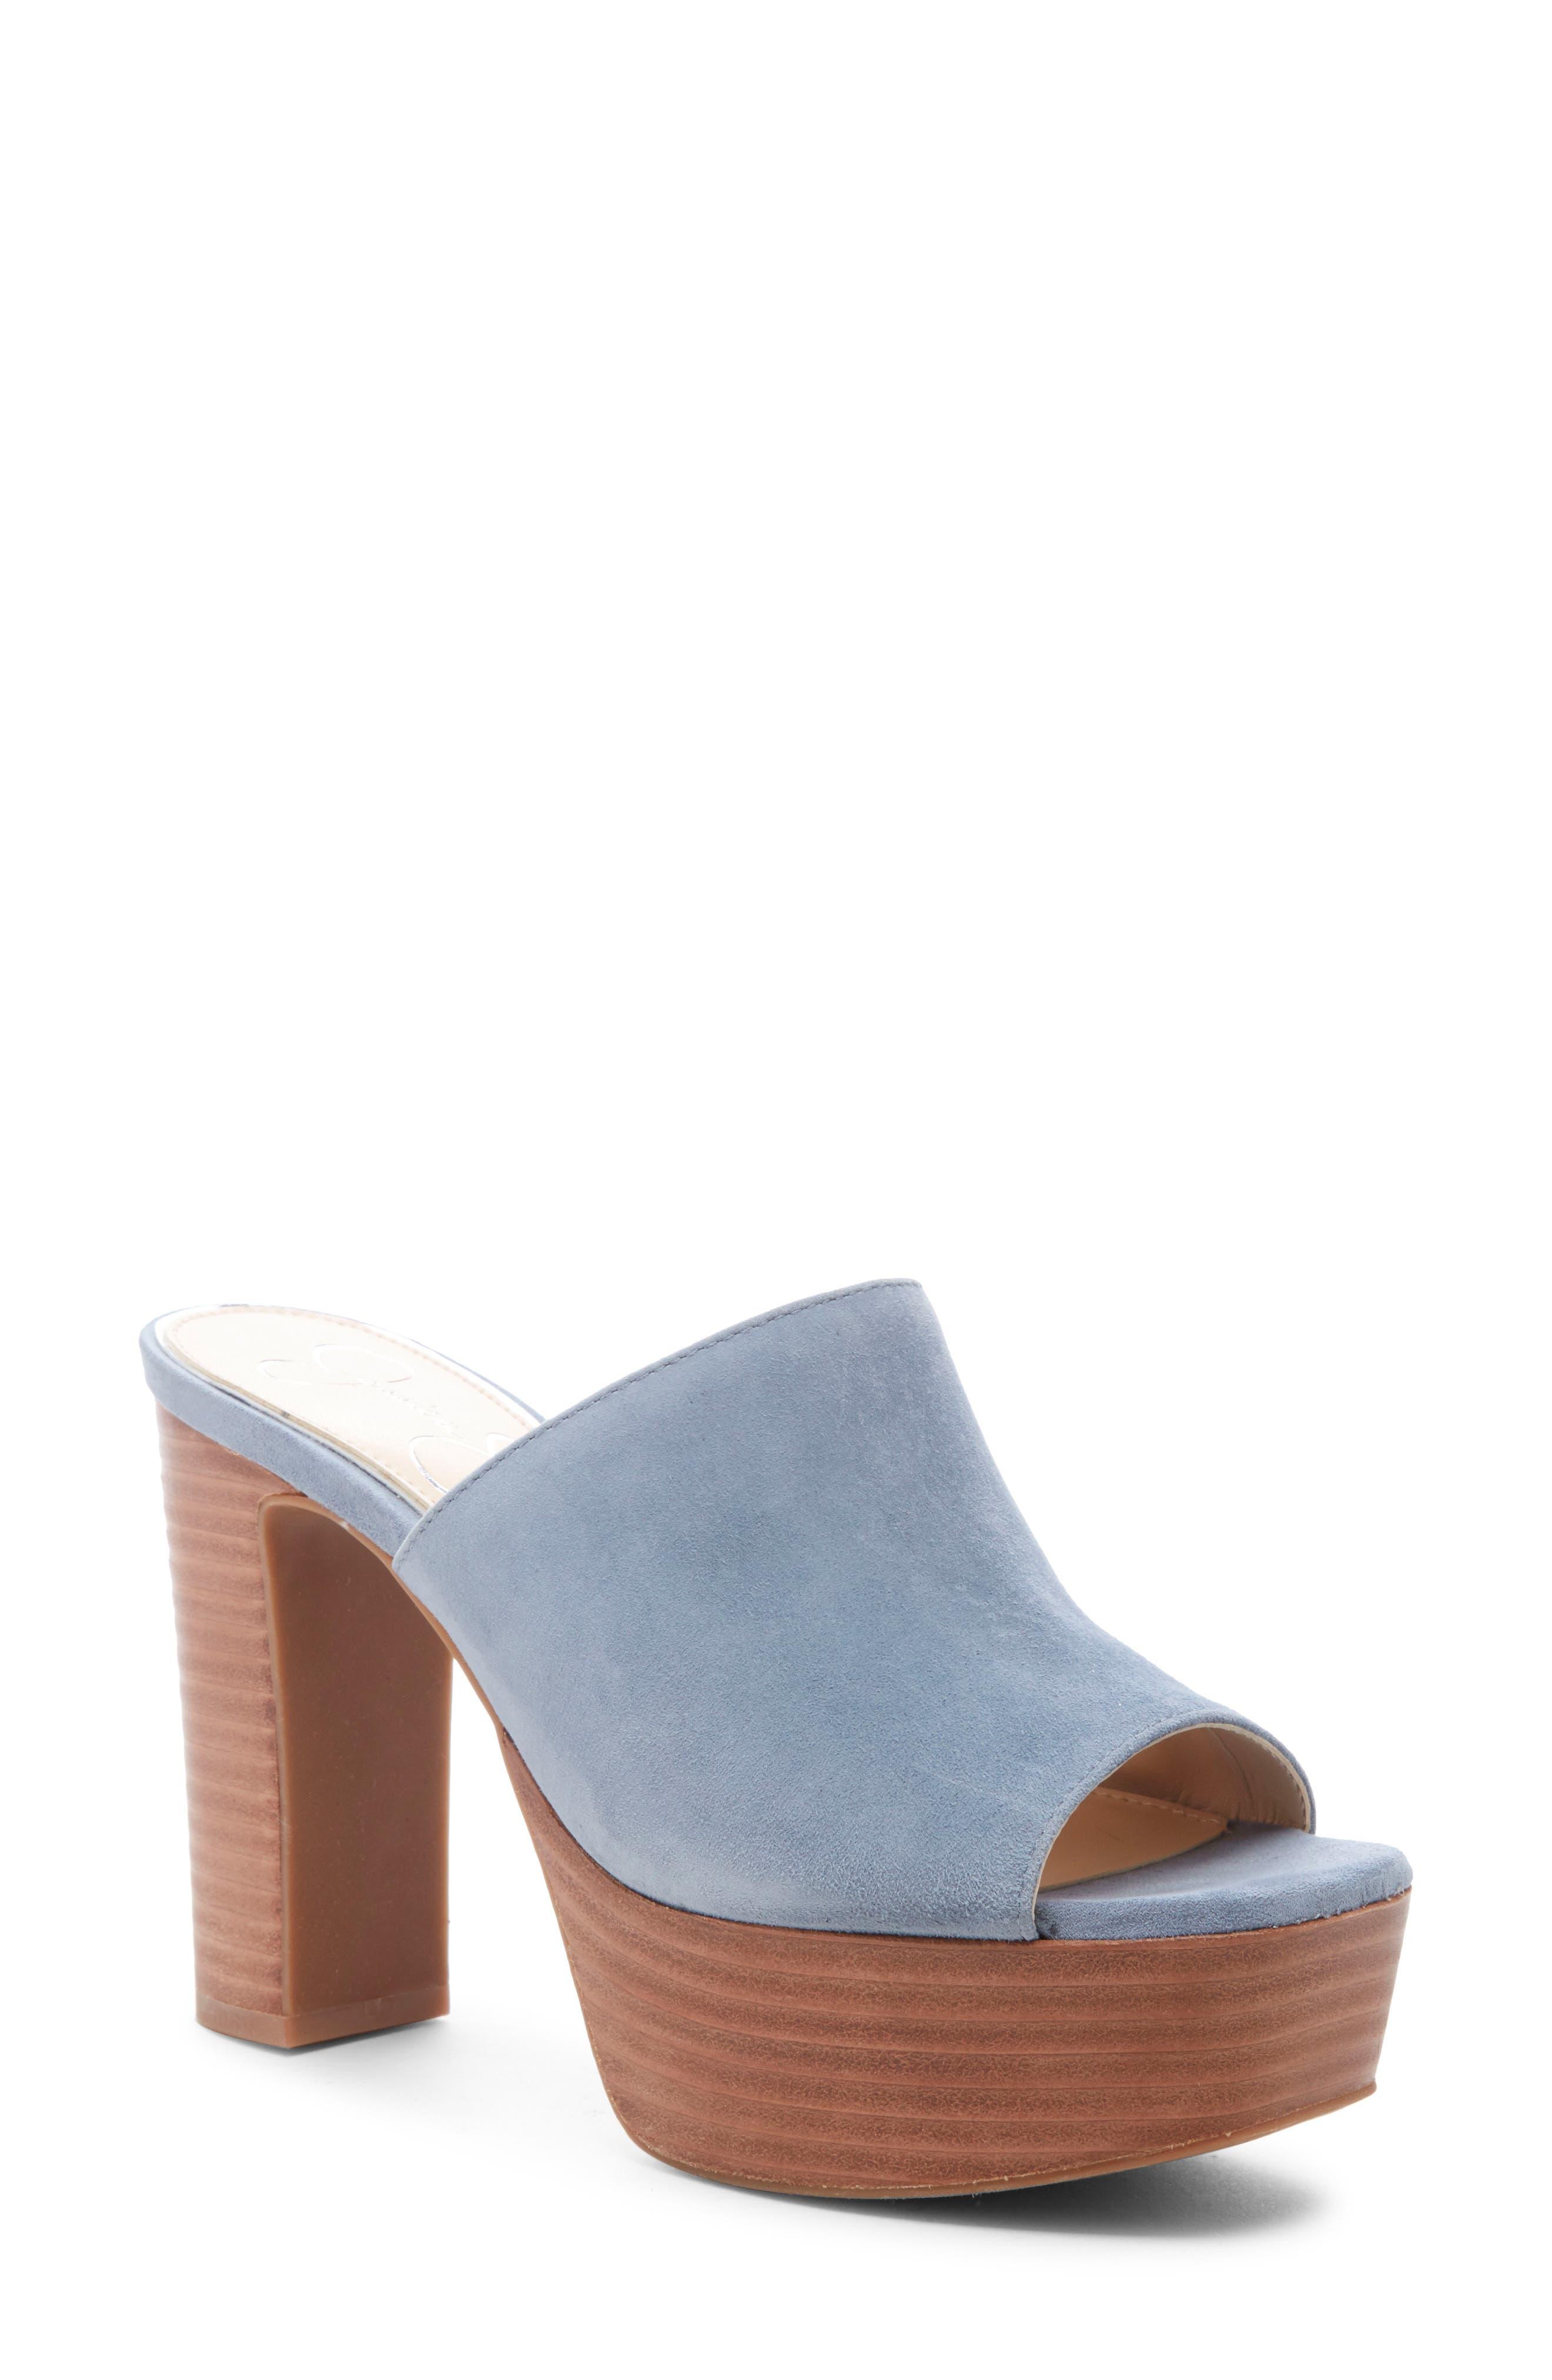 Jessica Simpson Camree Platform Sandal, Blue/green